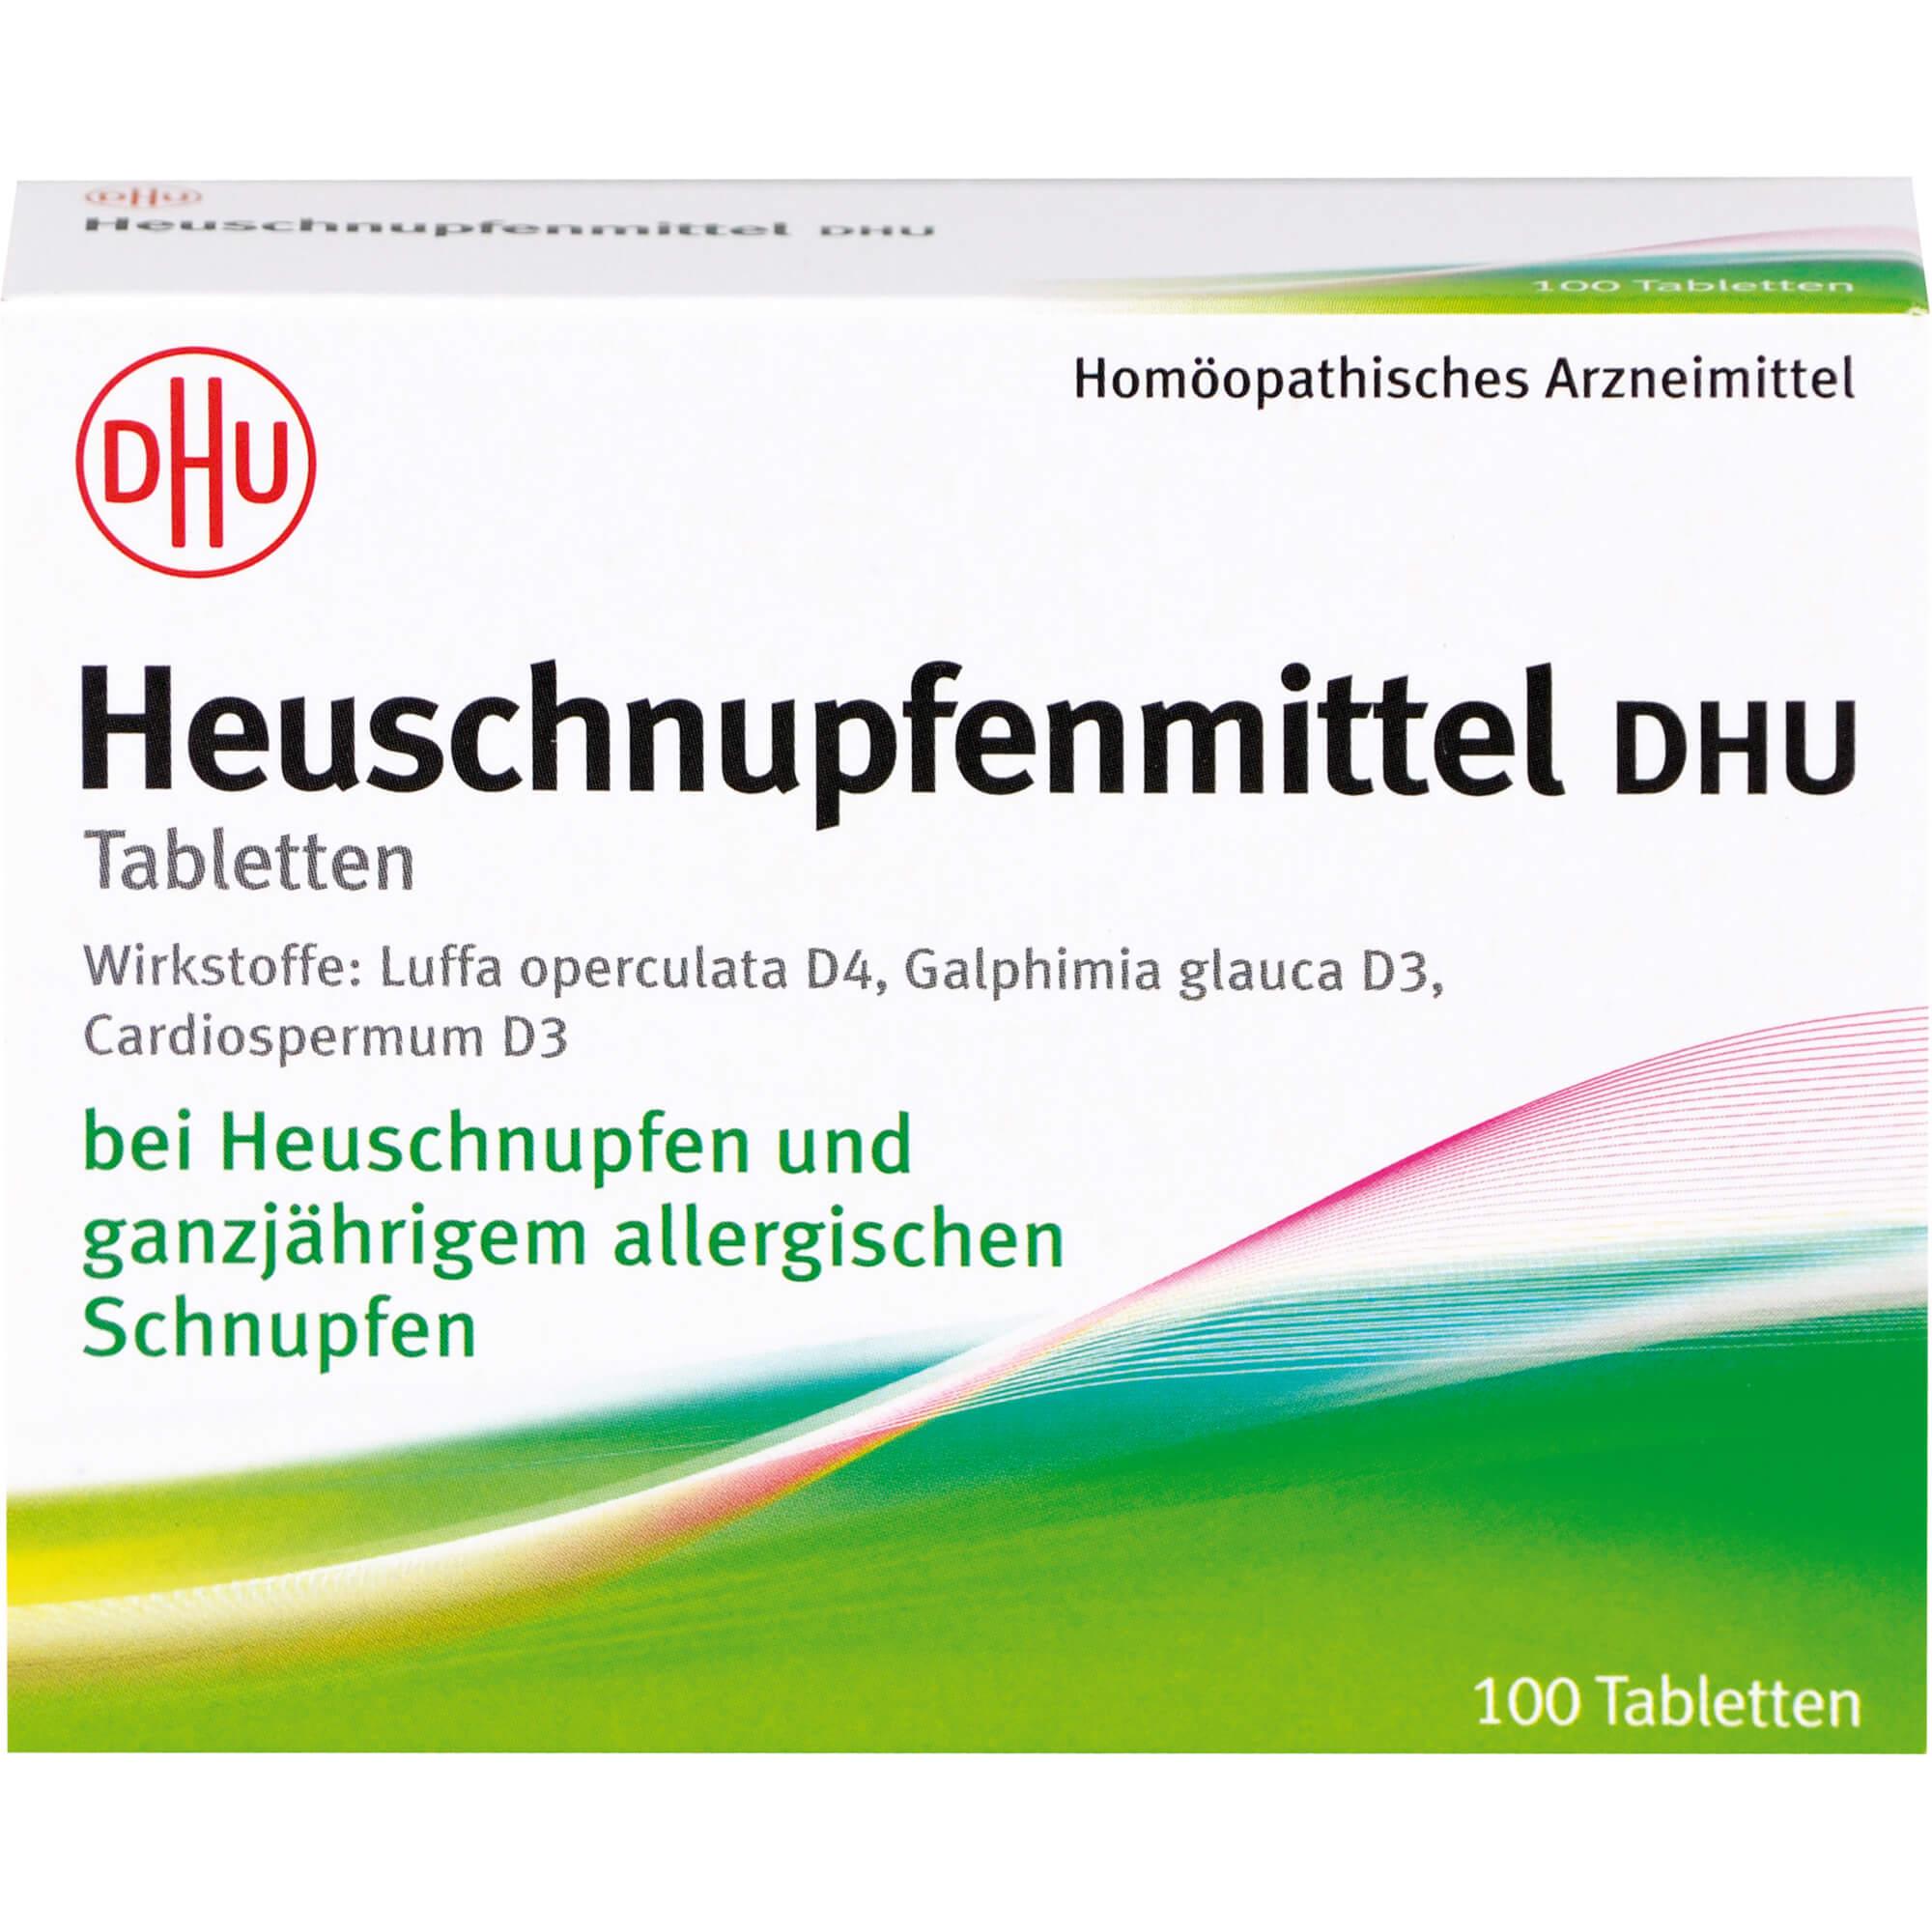 HEUSCHNUPFENMITTEL-DHU-Tabletten